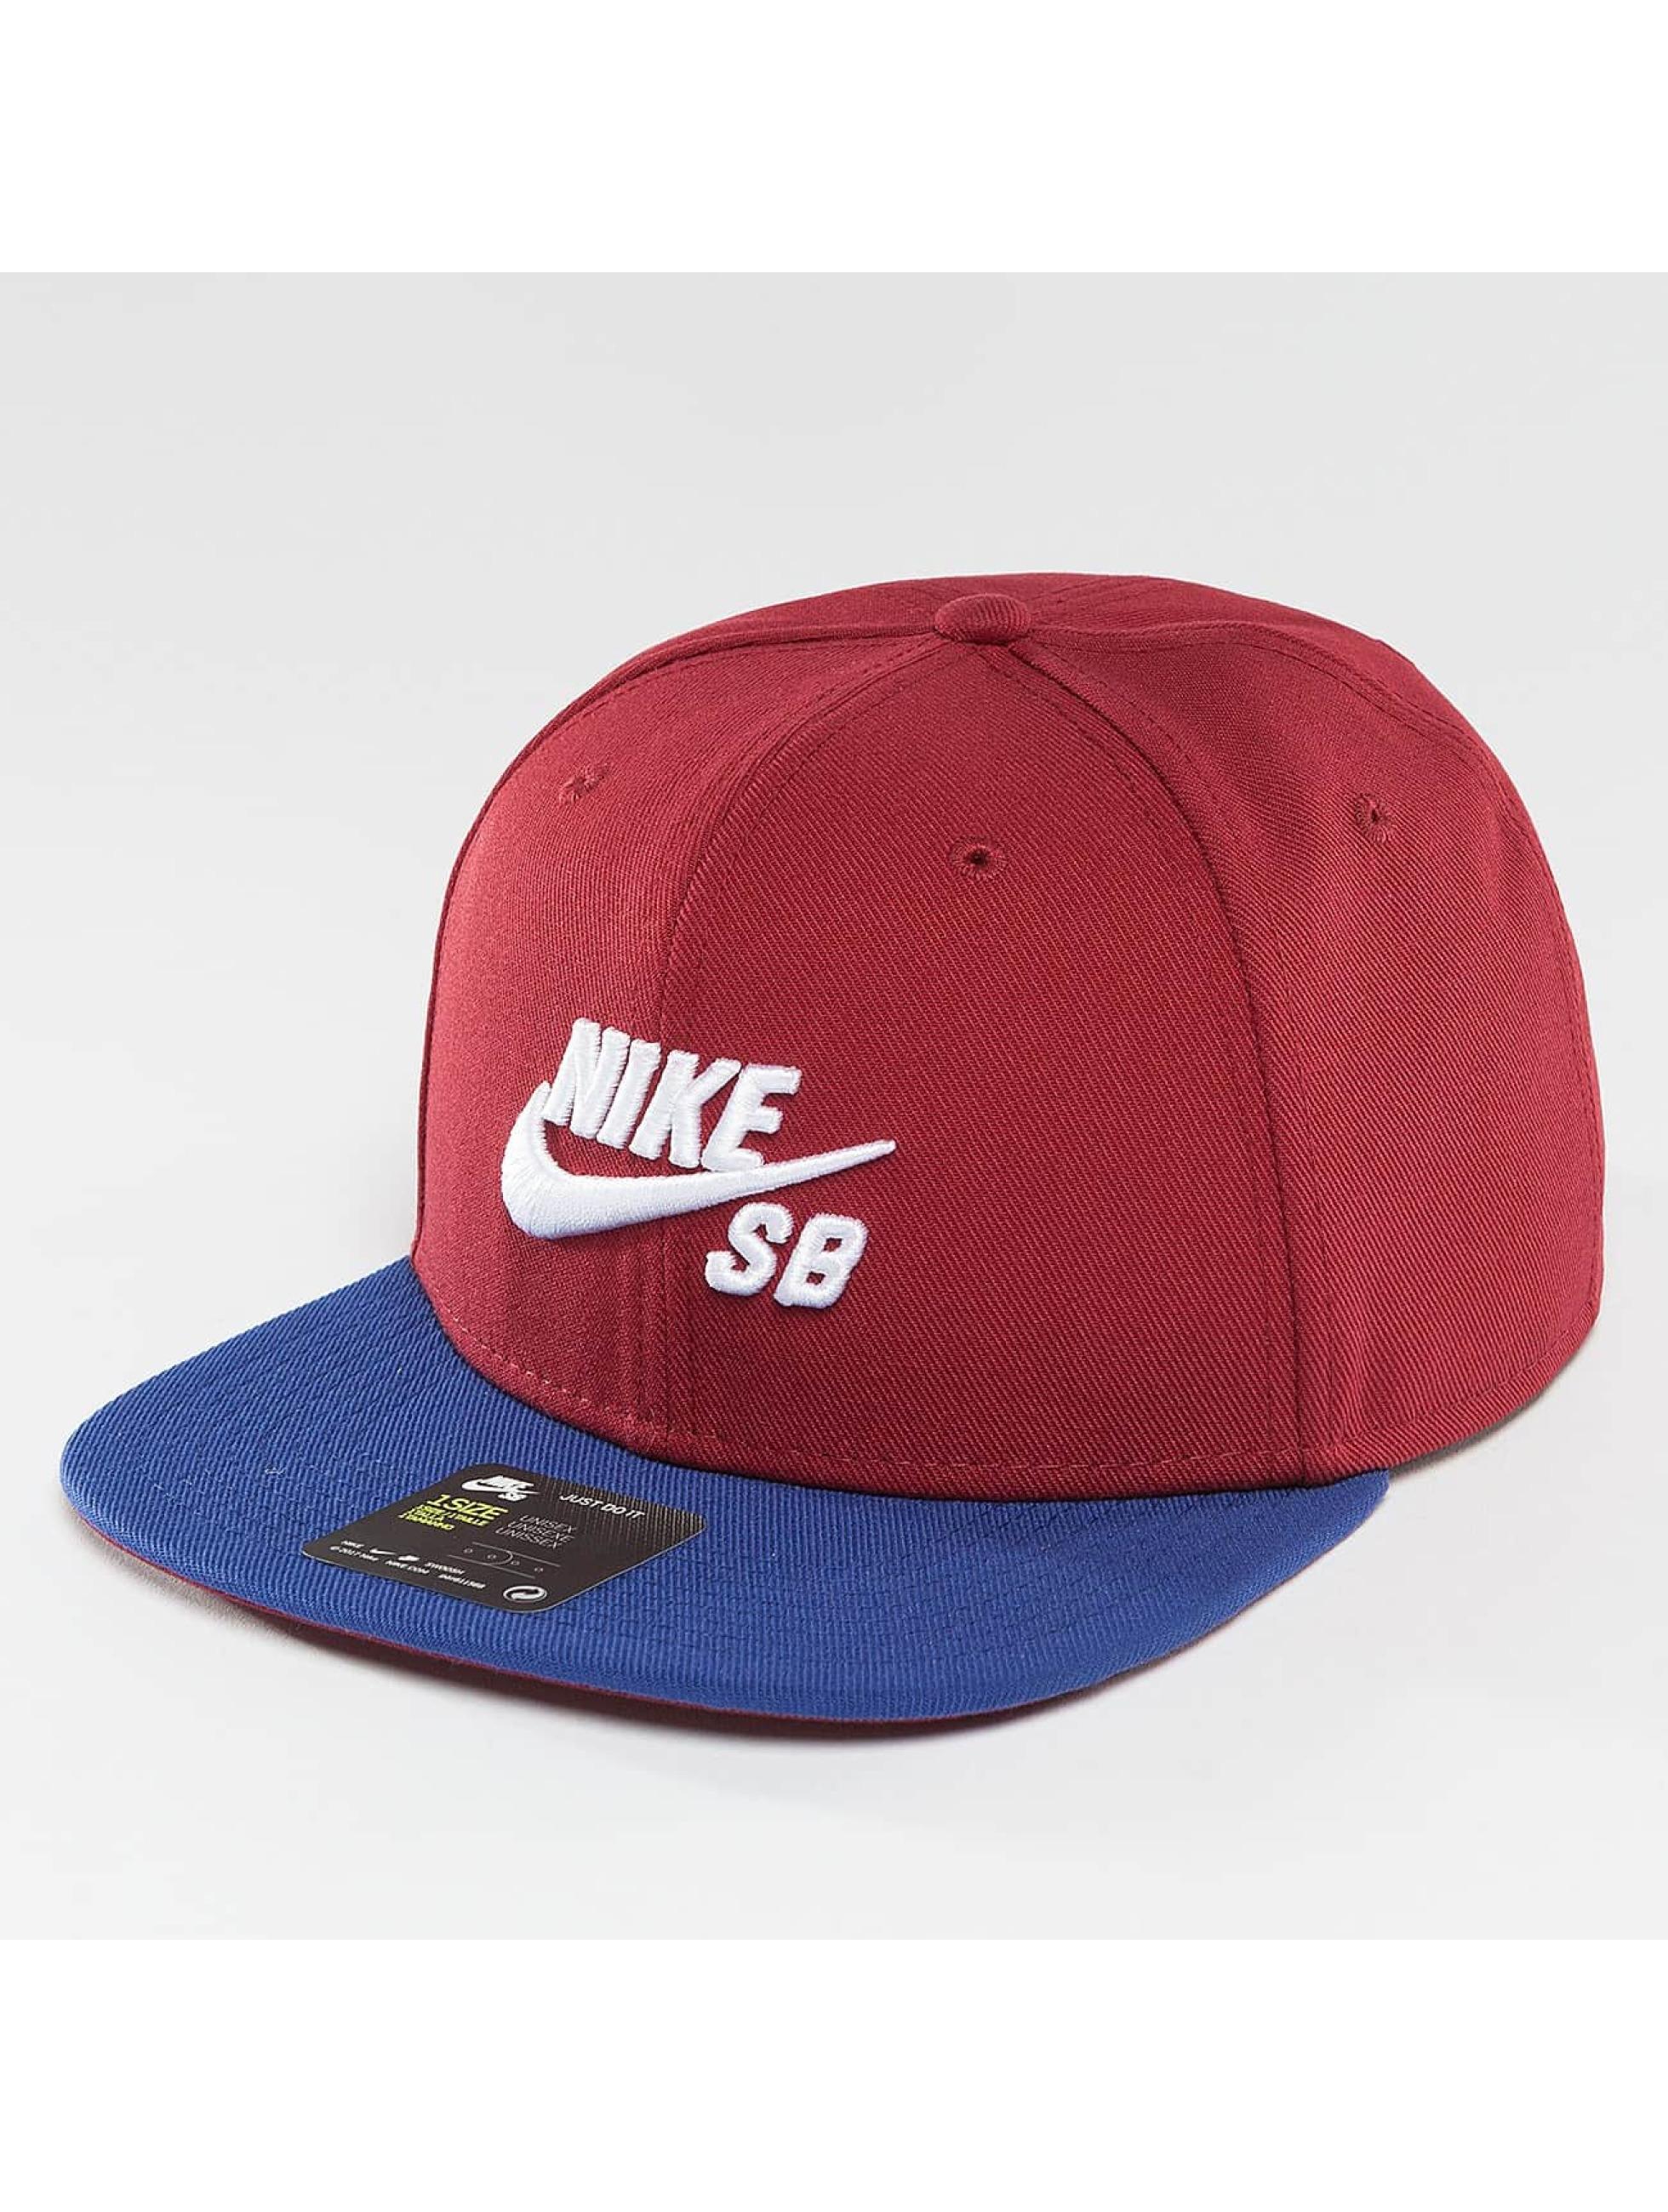 Nike SB Icon Snapback Cap Team Red/Deep Royal/Black/White Sale Angebote Gablenz